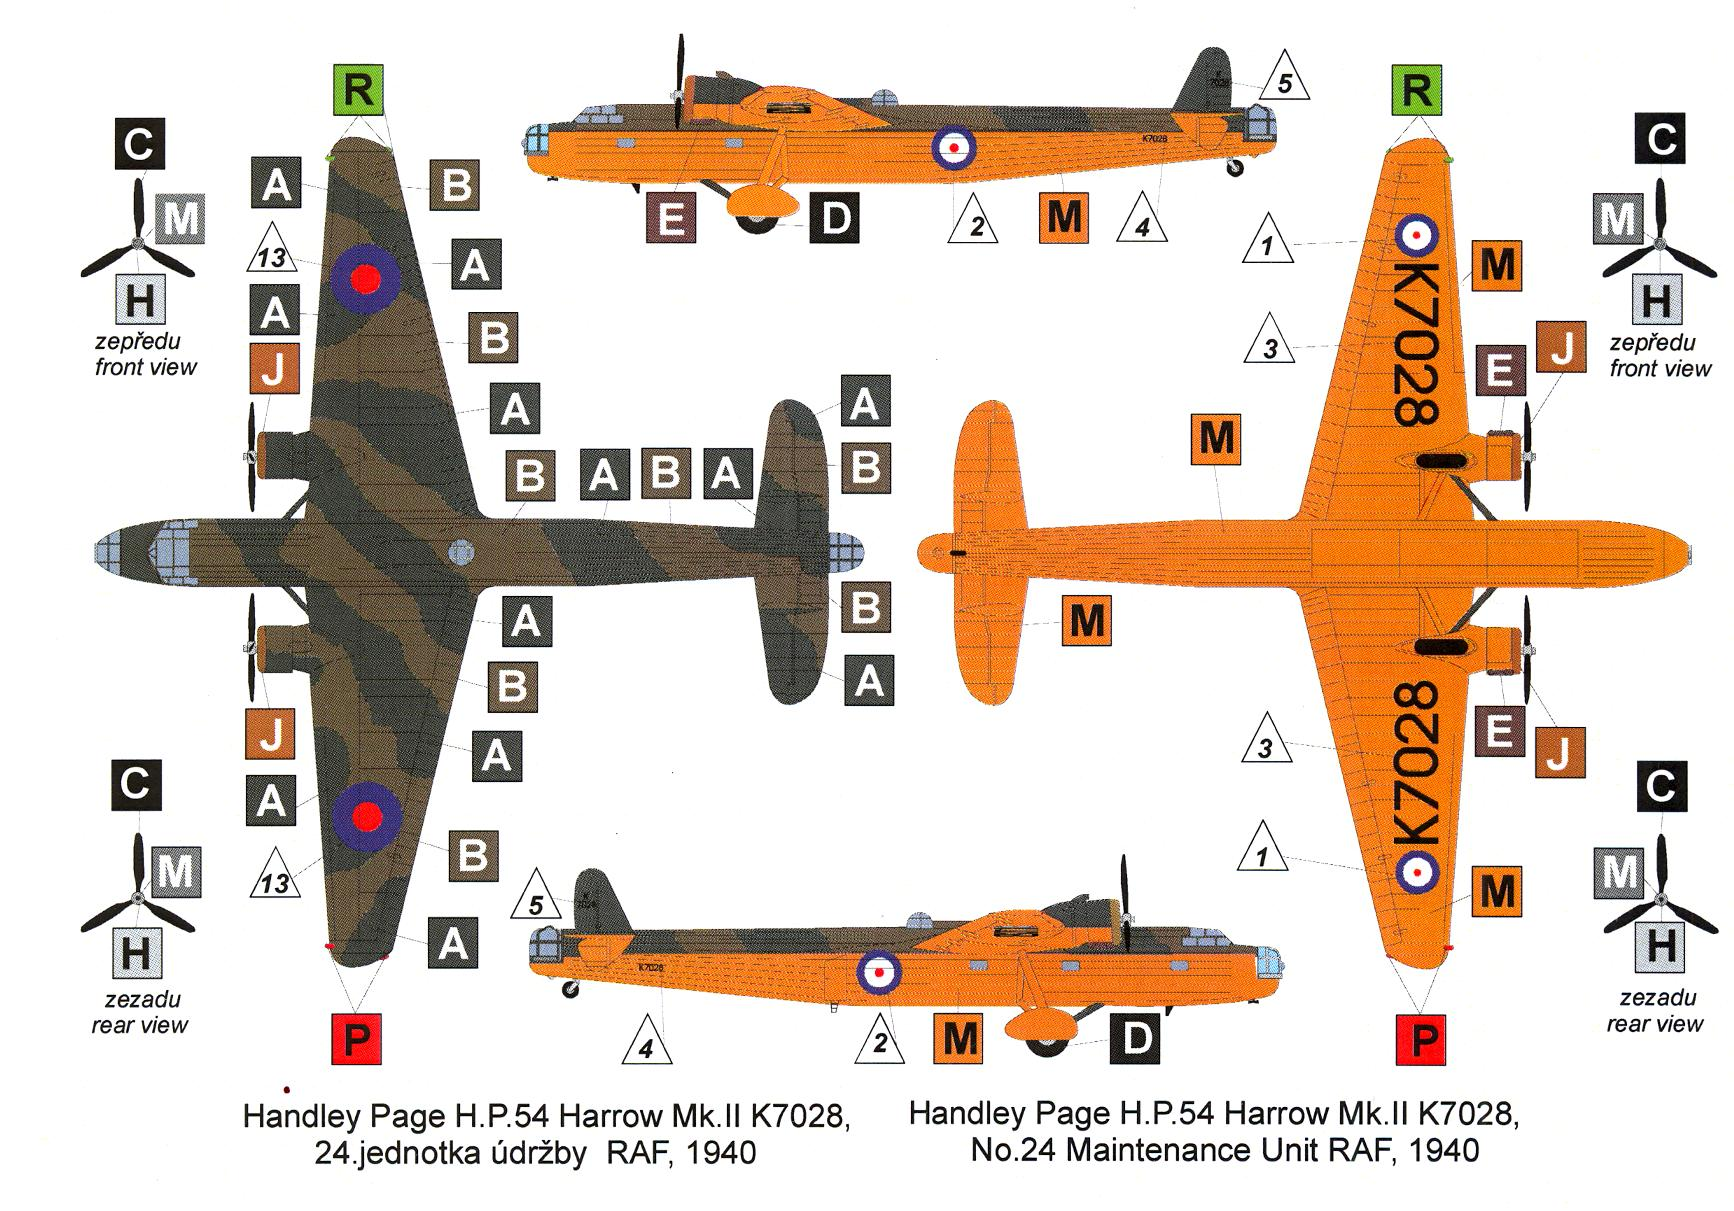 Valom Models 1/72 HANDLEY PAGE SPARROW Mk.II British Transport Military  Airplane Models & Kits Toy Models & Kits Toys & Hobbies